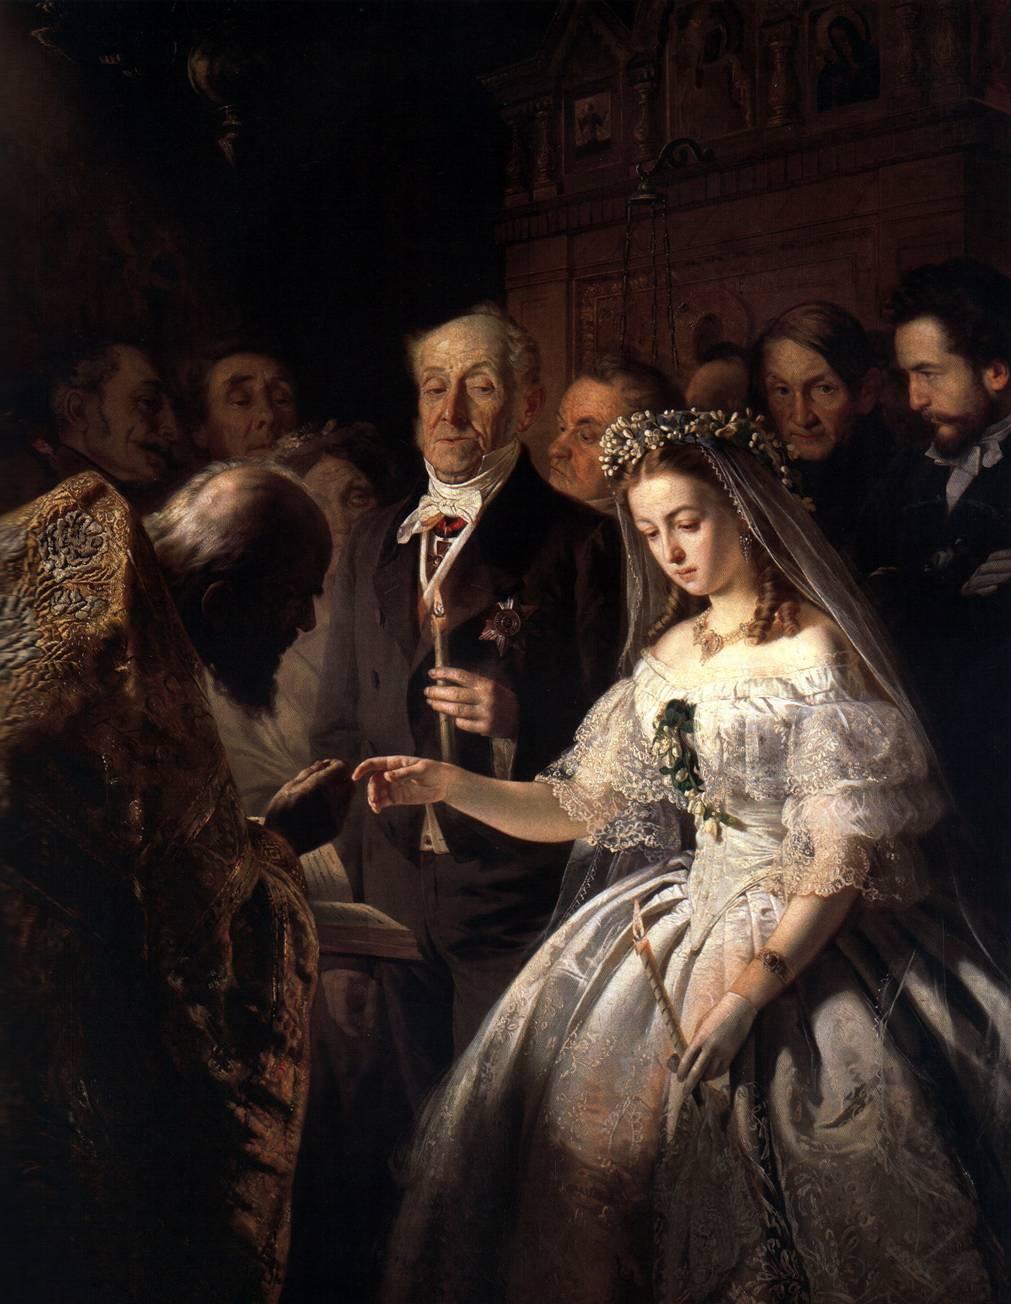 http://upload.wikimedia.org/wikipedia/commons/9/92/V.V.Pukirev_-_The_Arranged_Marriage.jpg